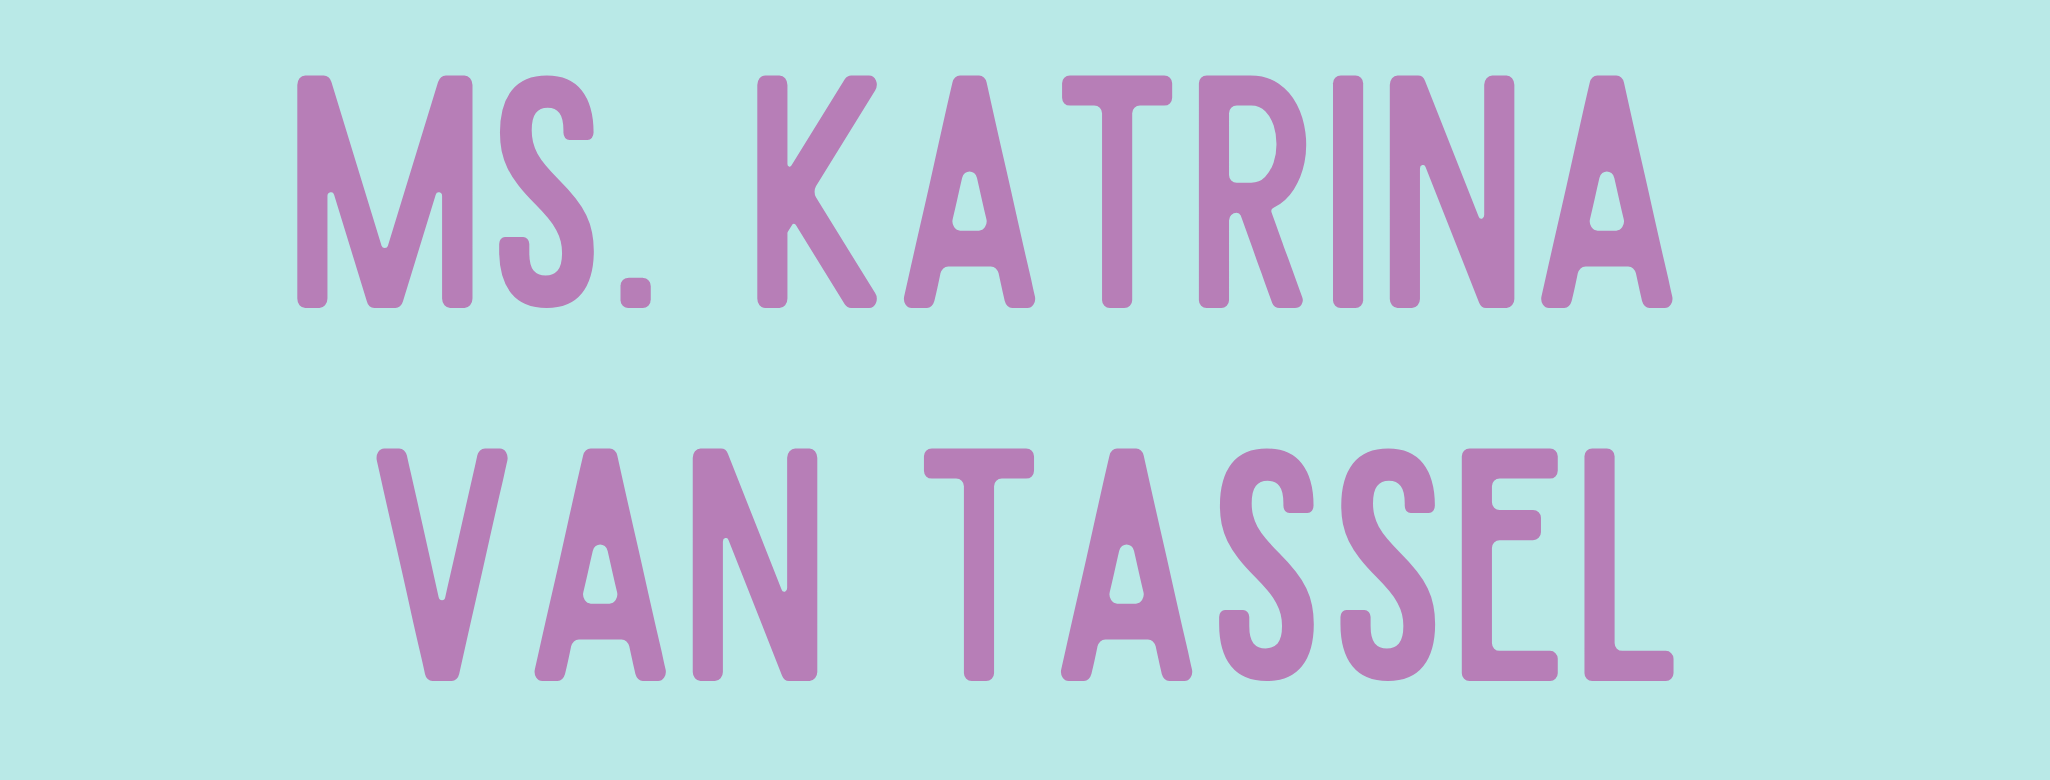 Ms. Katrina Van Tassel